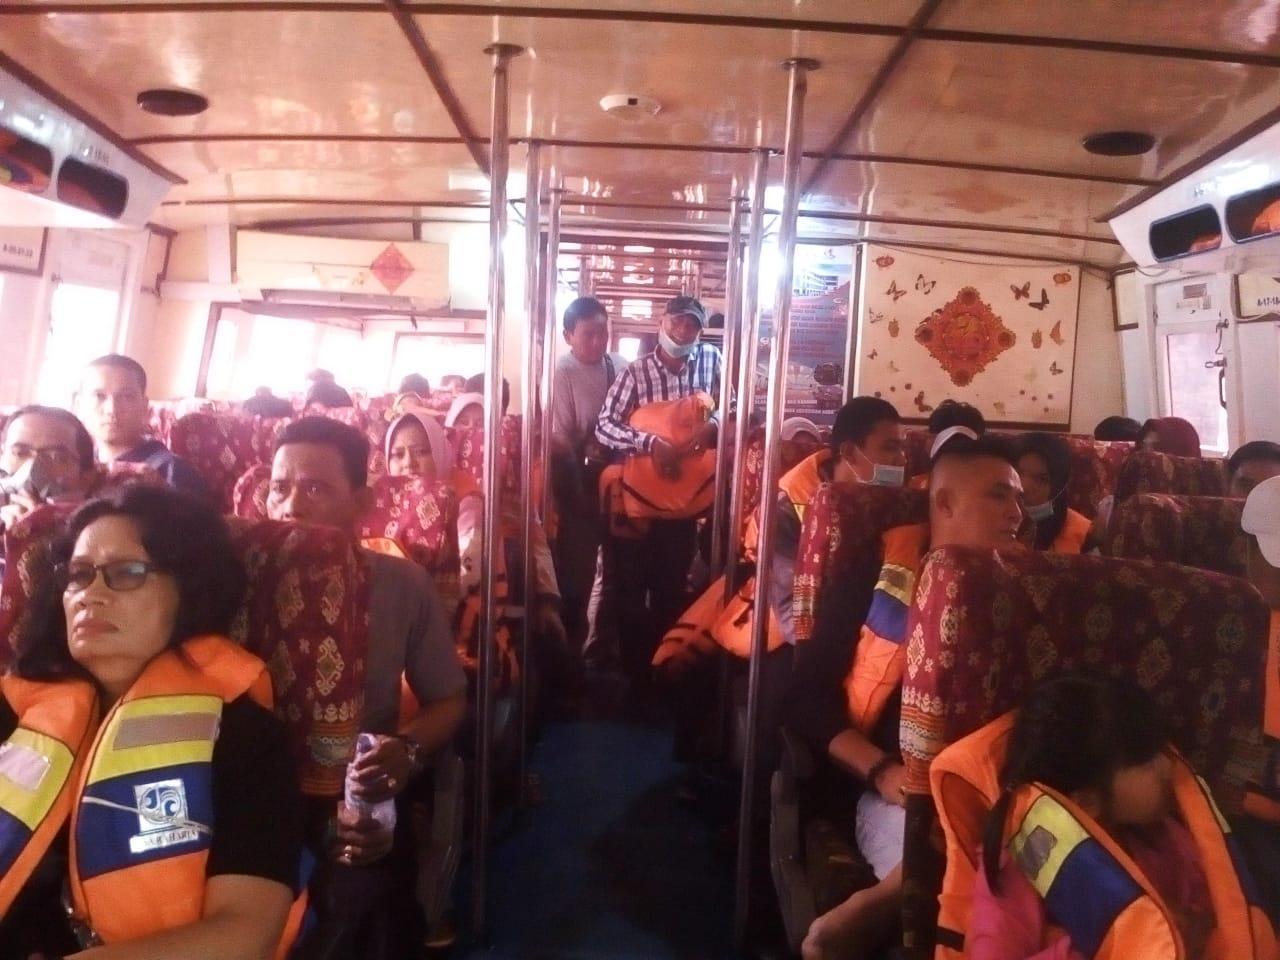 Kabut Asap Tak Halangi Aktivitas Pelabuhan Sungai Duku